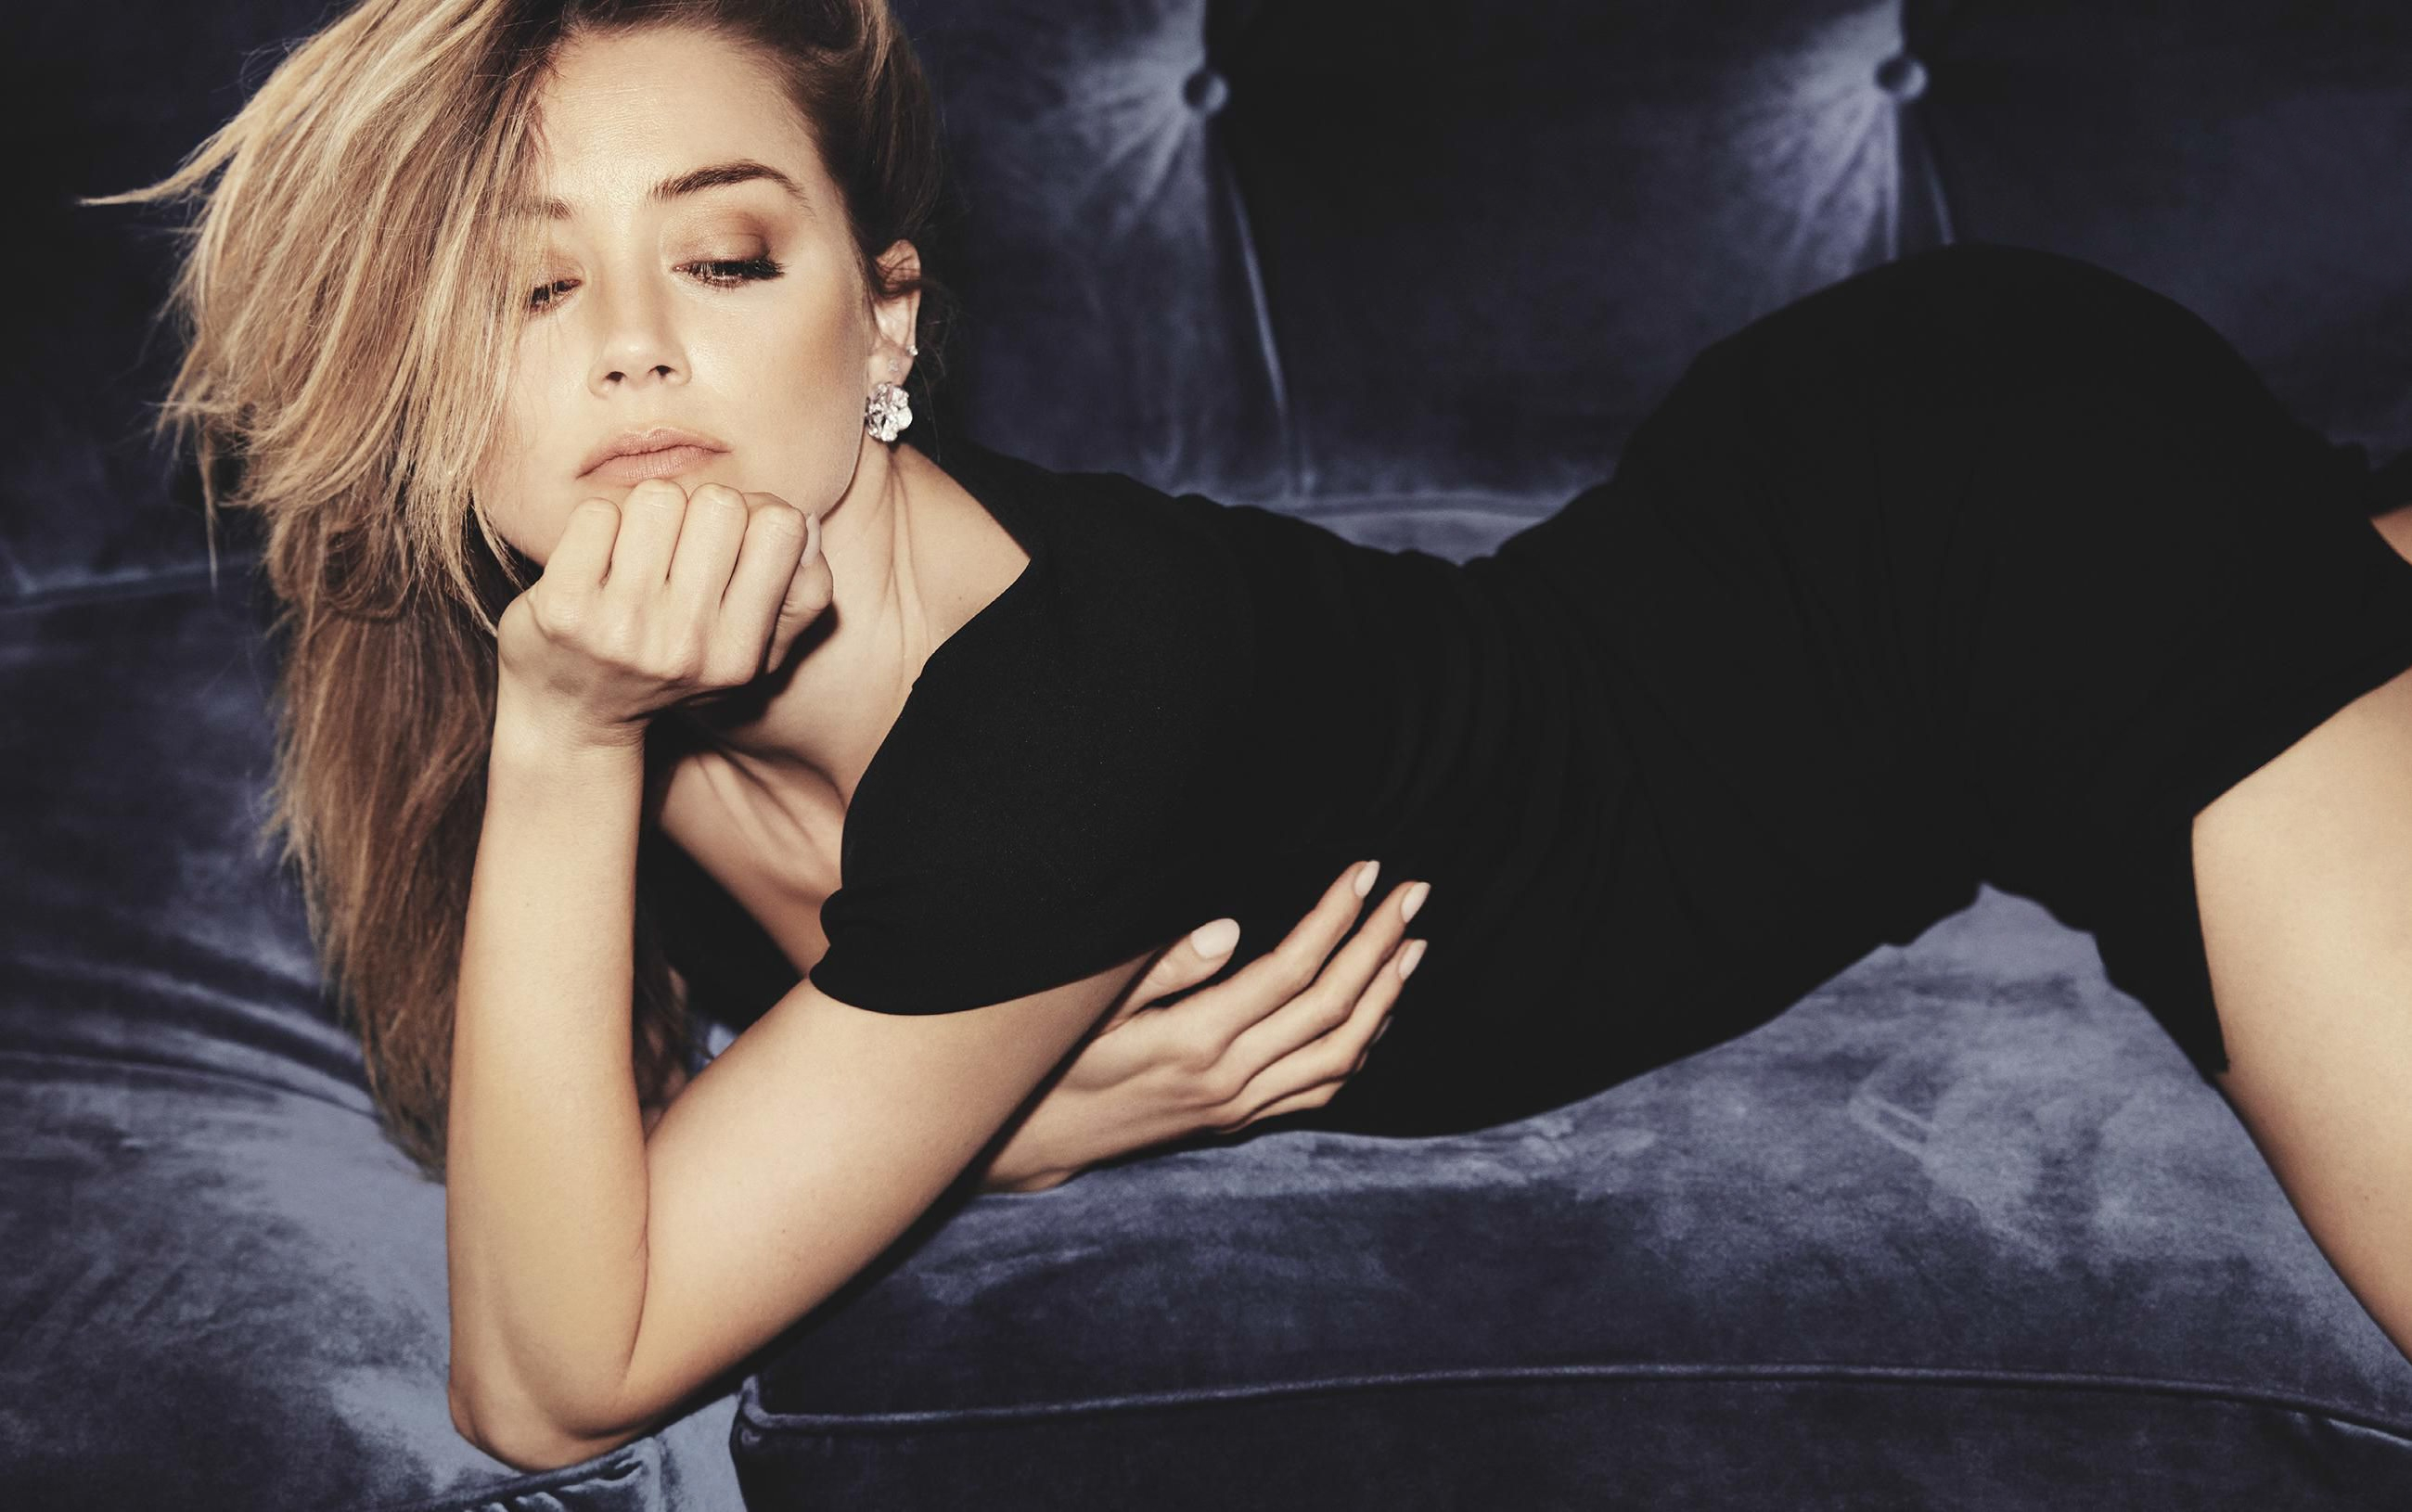 Amber Heard Gq Photoshoot Australia, Hd Celebrities, 4K -5031